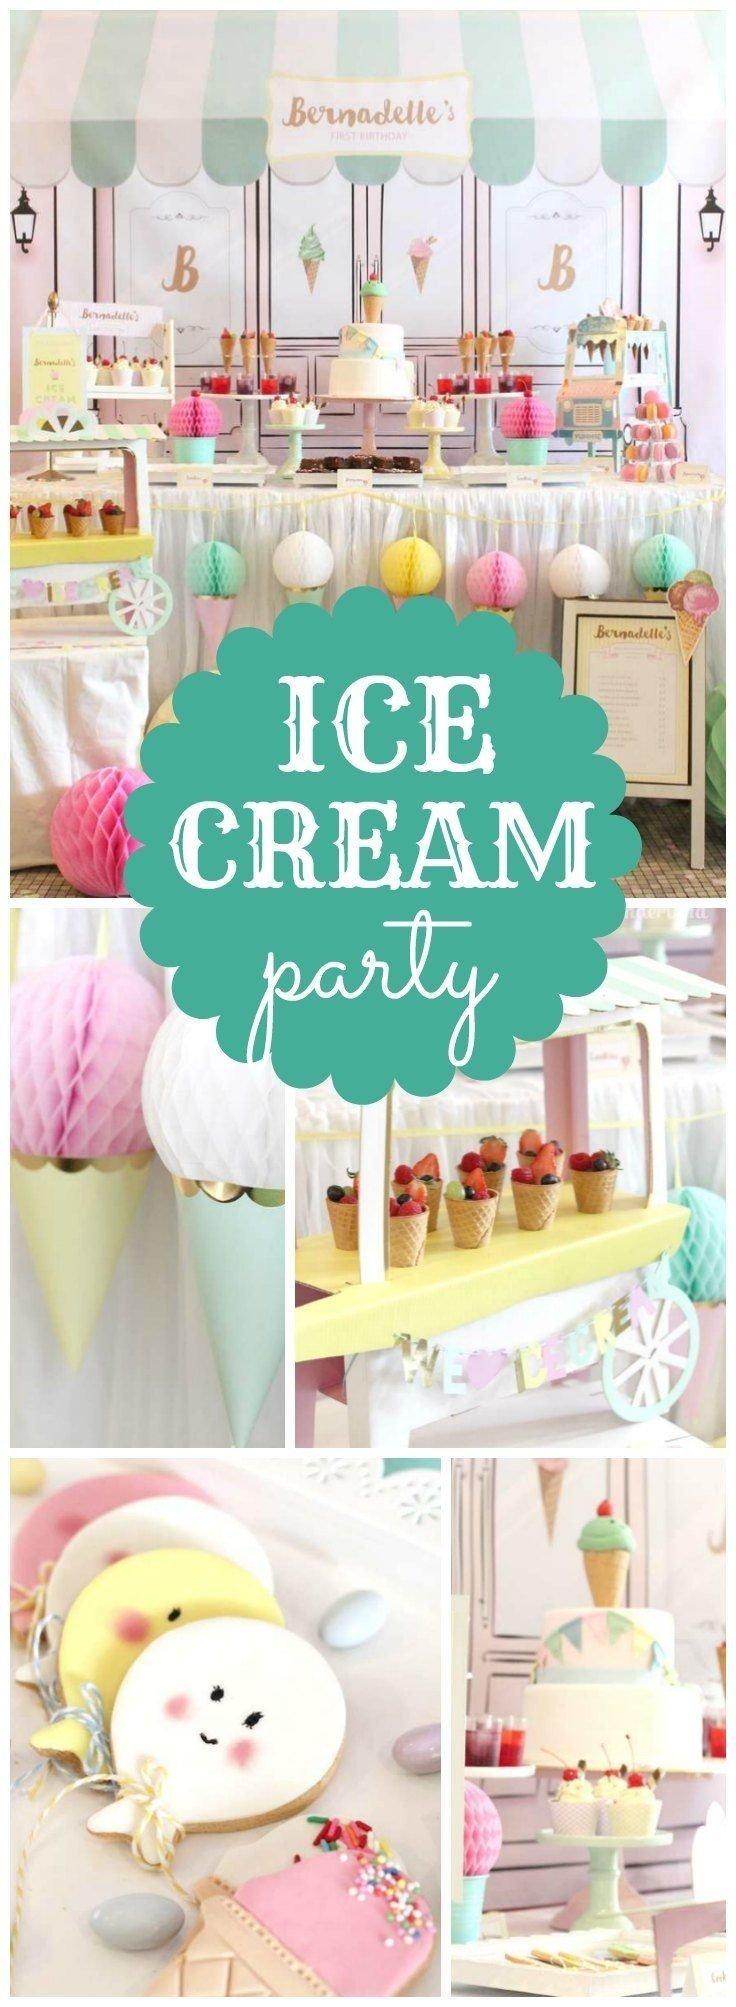 10 Fashionable 5Th Birthday Party Ideas For Girls 416 best girl birthday party ideas images on pinterest birthday 1 2020